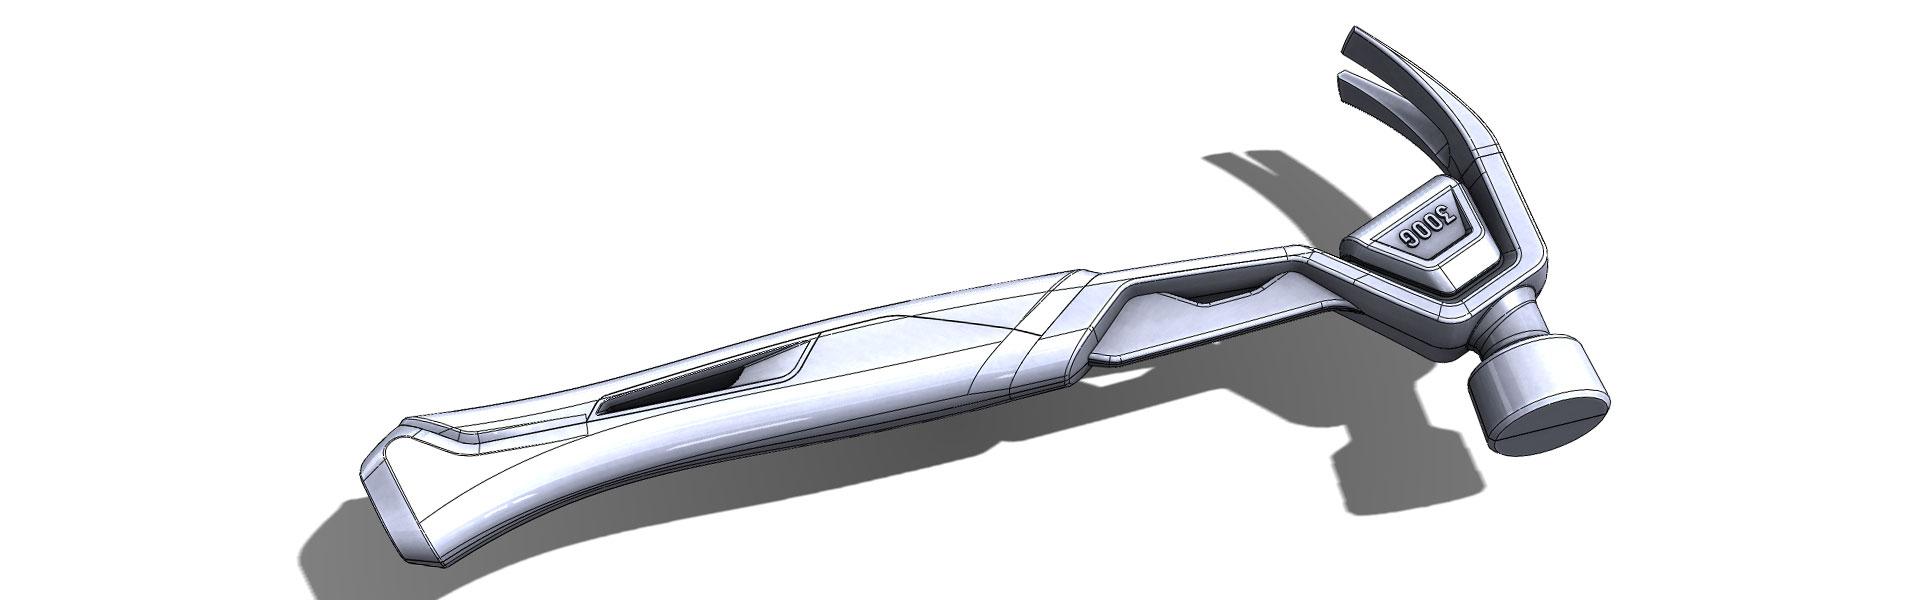 Hammer Concept 3